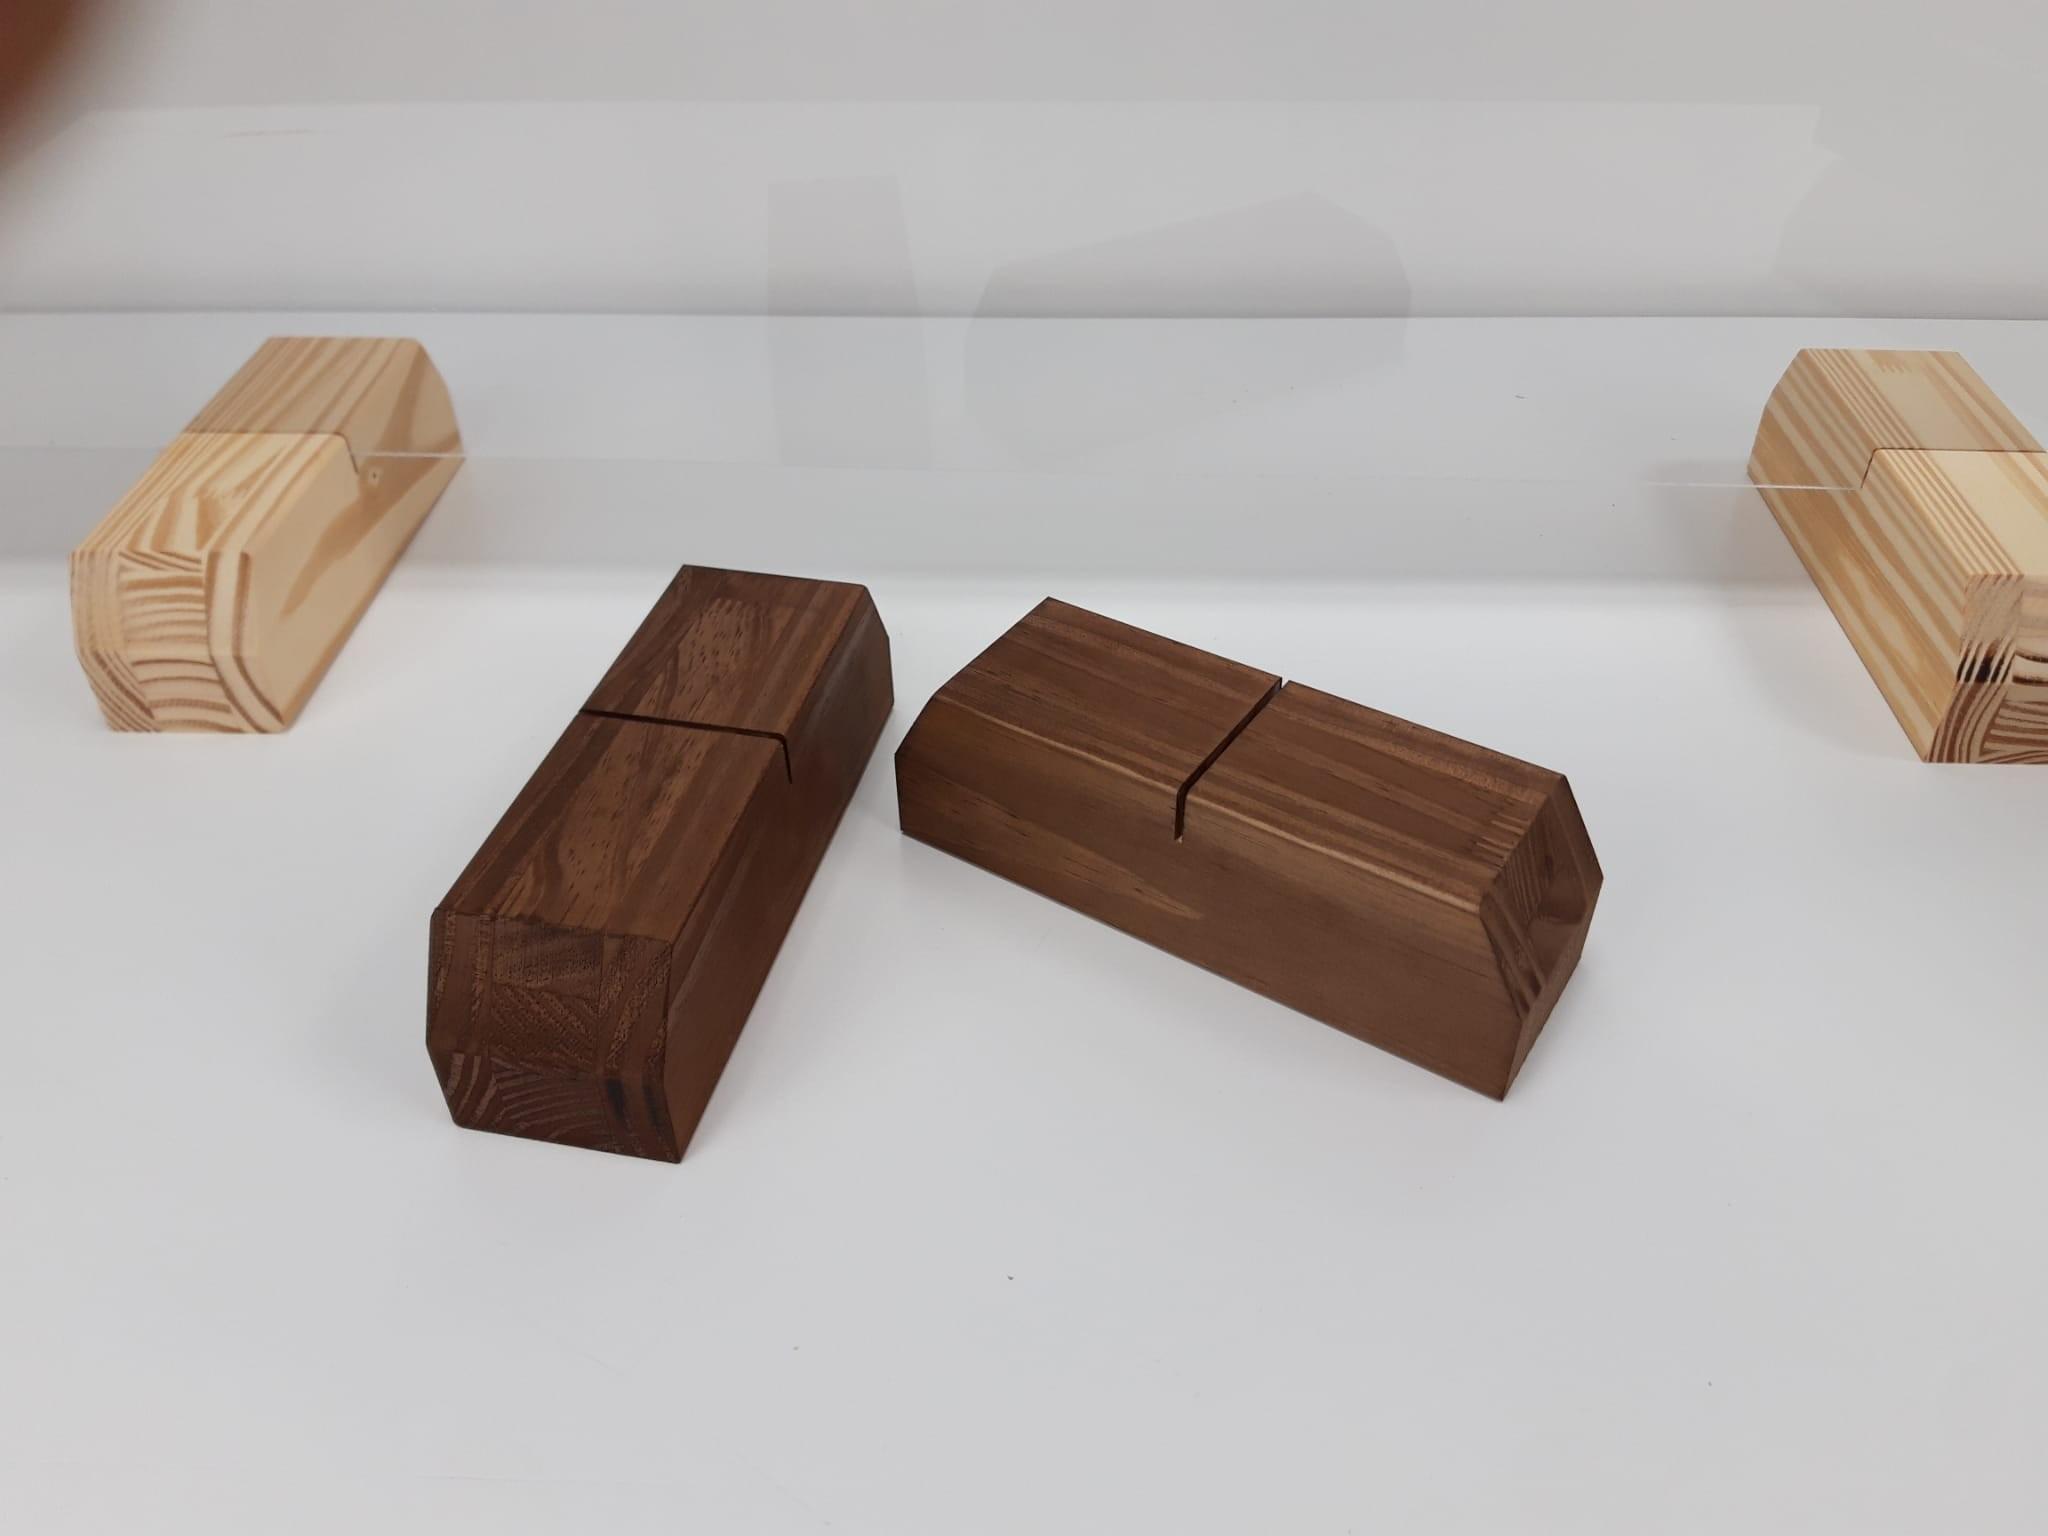 comprar caja de madera con tapa corredera alistonada botellas